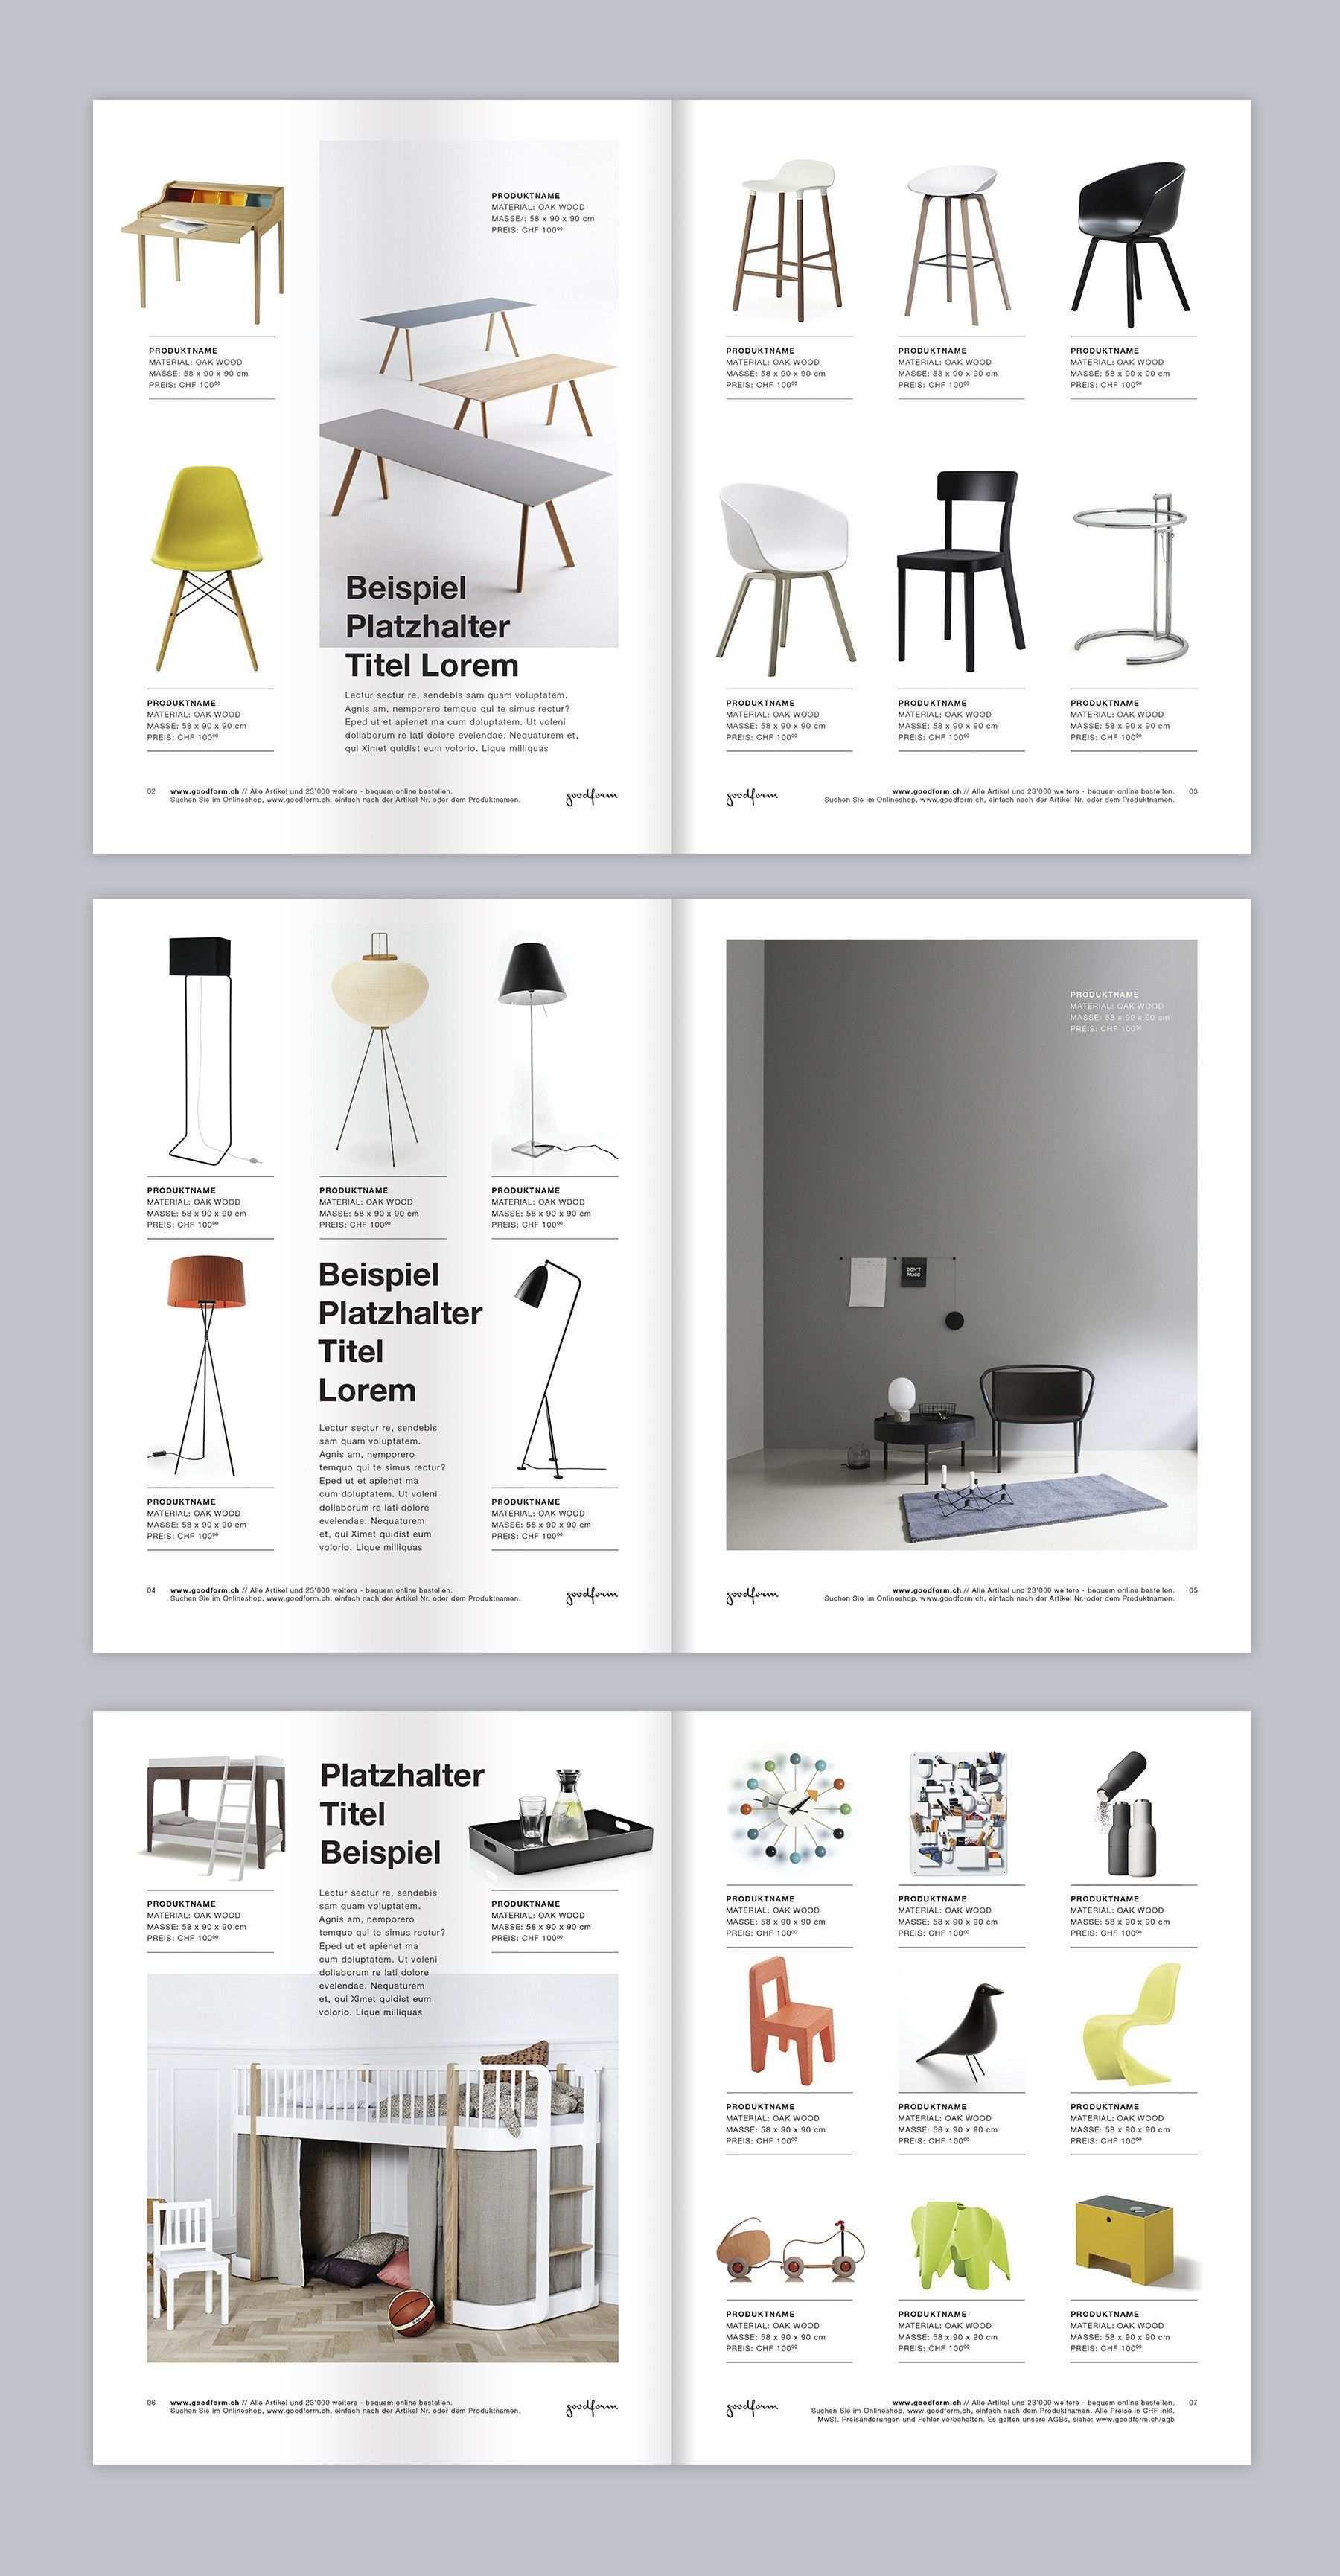 Brochure Catalog Minimalist Style Layout For Furniture Store 99designs Desain Desain Katalog Interior